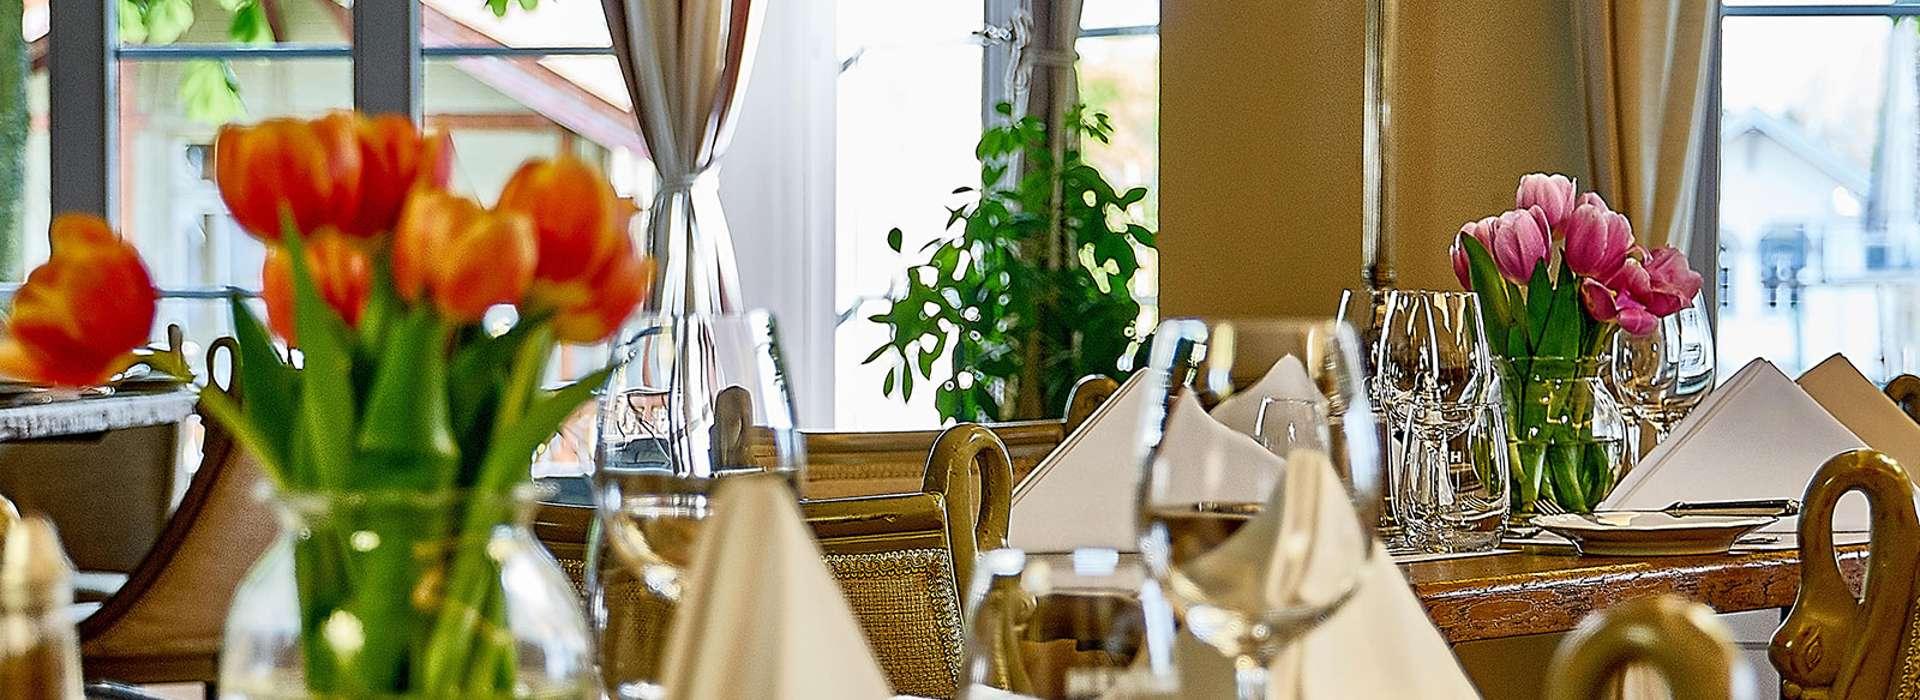 Schloss Romashorn 02 - Park-Hotel Inseli - DSC08515 - 1920x700